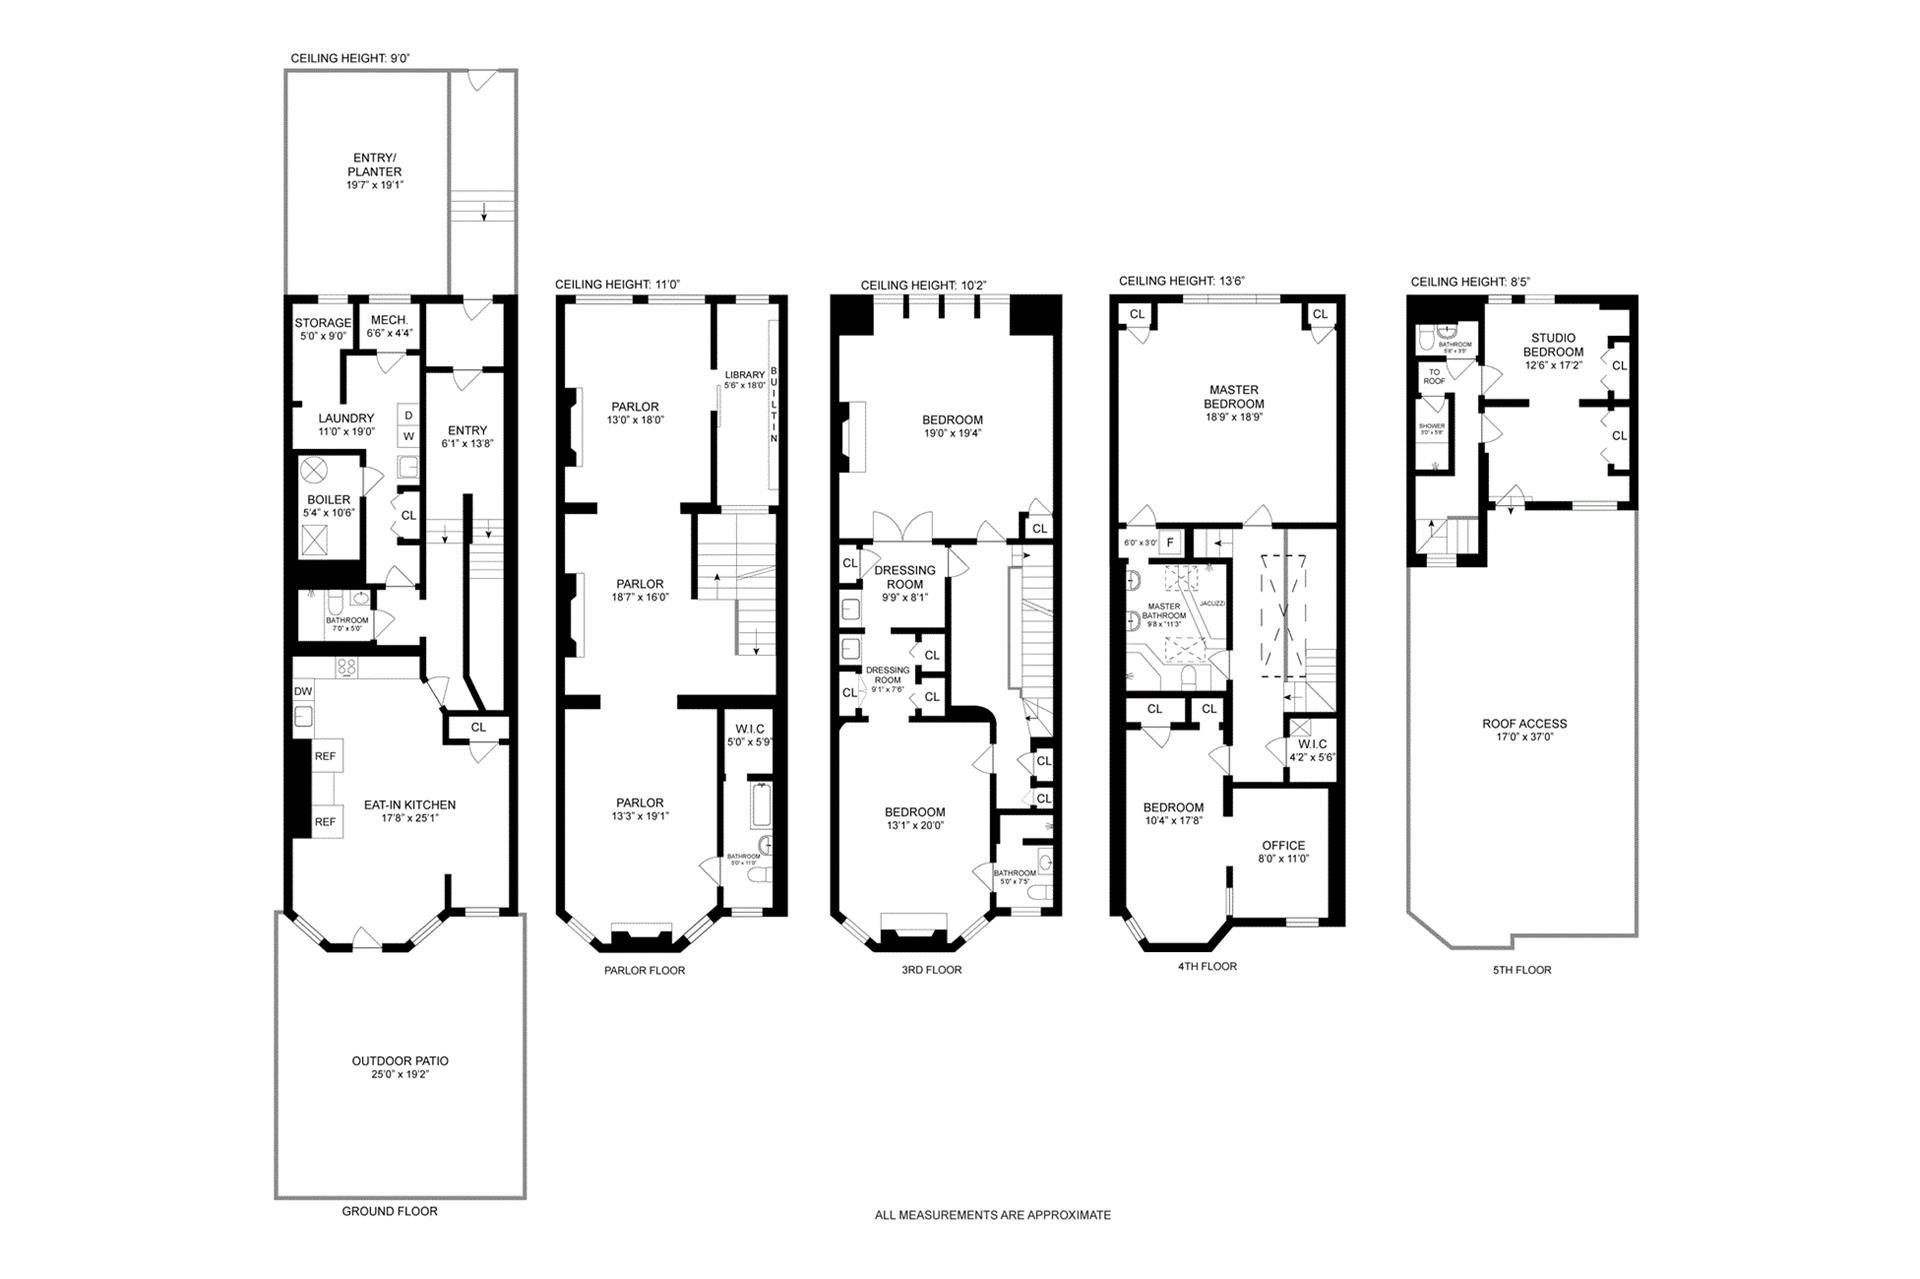 Floor plan of 325 Convent Avenue - Hamilton Heights, New York